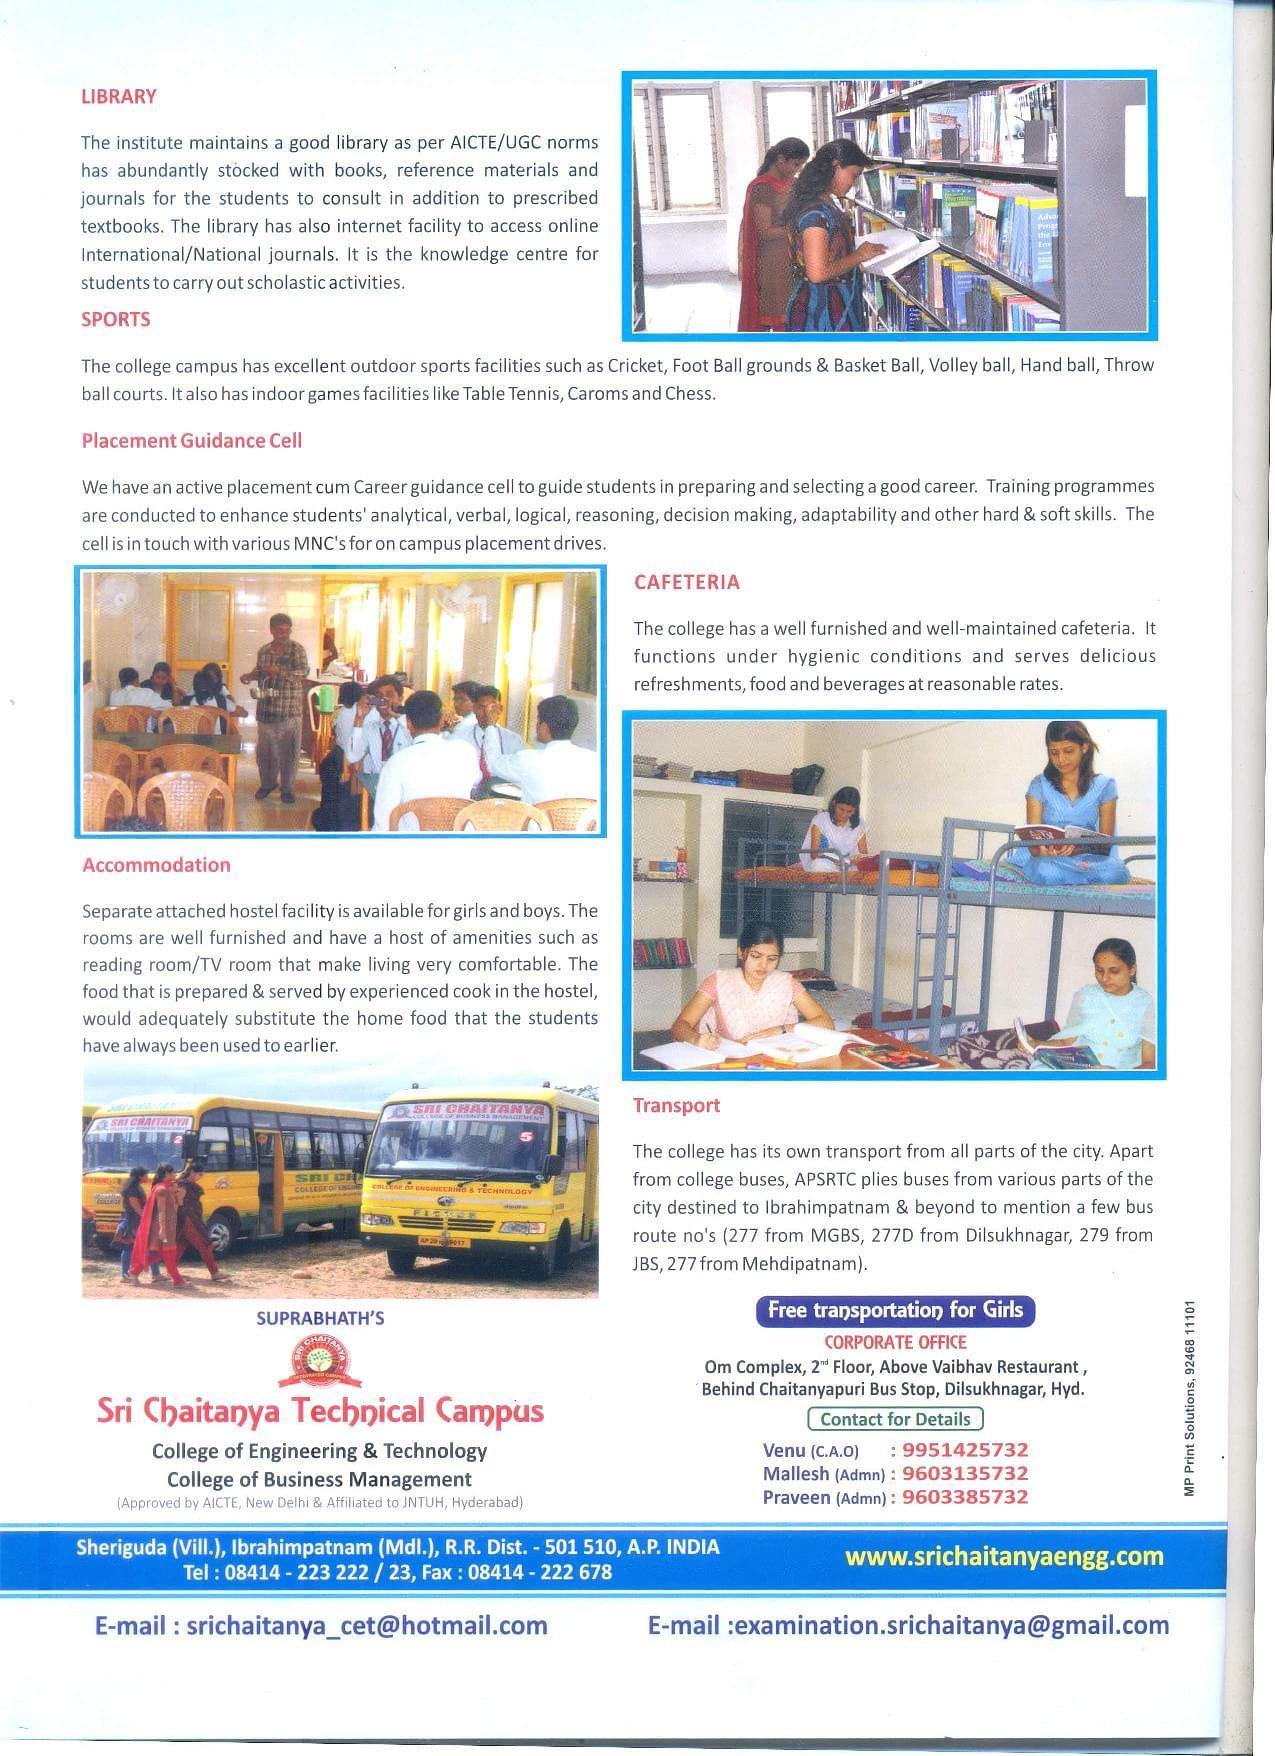 Sri Chaitanya Technical Campus, Rangareddi - Admissions, Contact